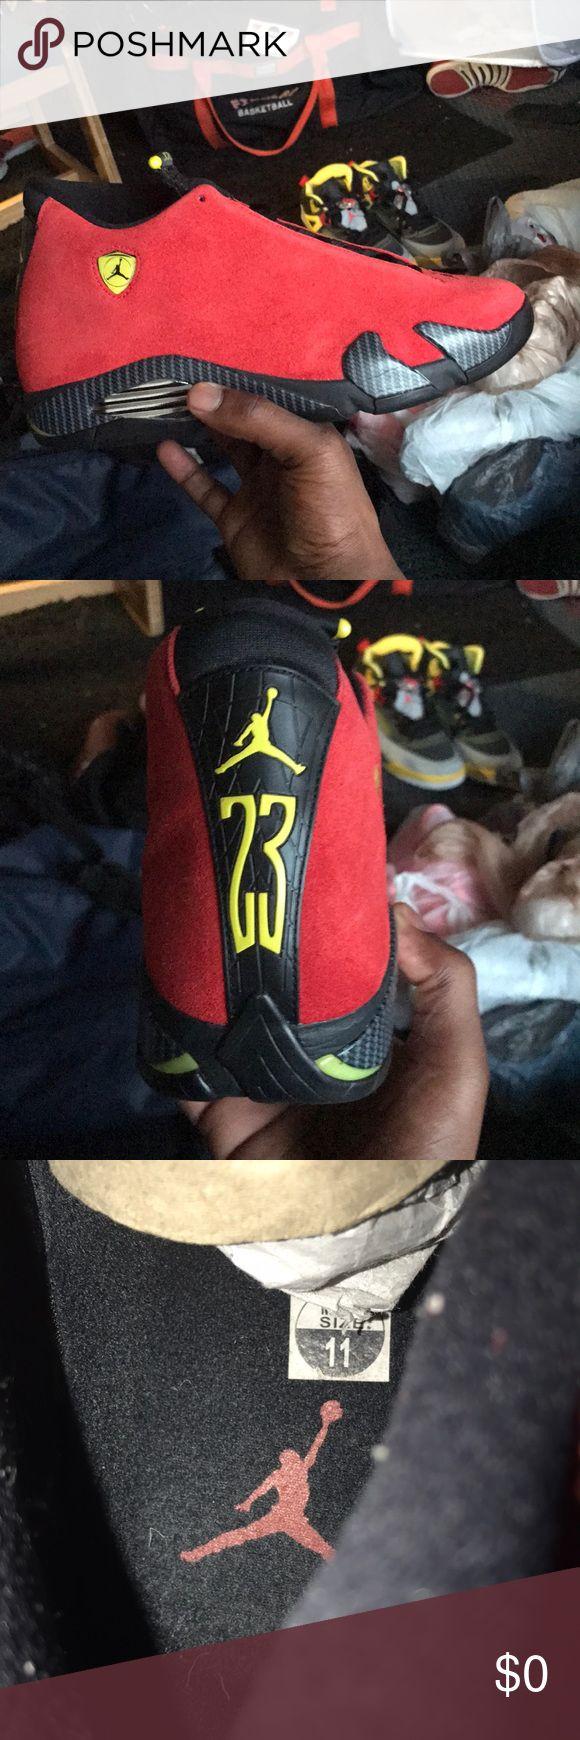 "Nike Air Jordan 14 Retro ""Ferrari"" Great conditon! Dead stock Jordan Shoes Sneakers"